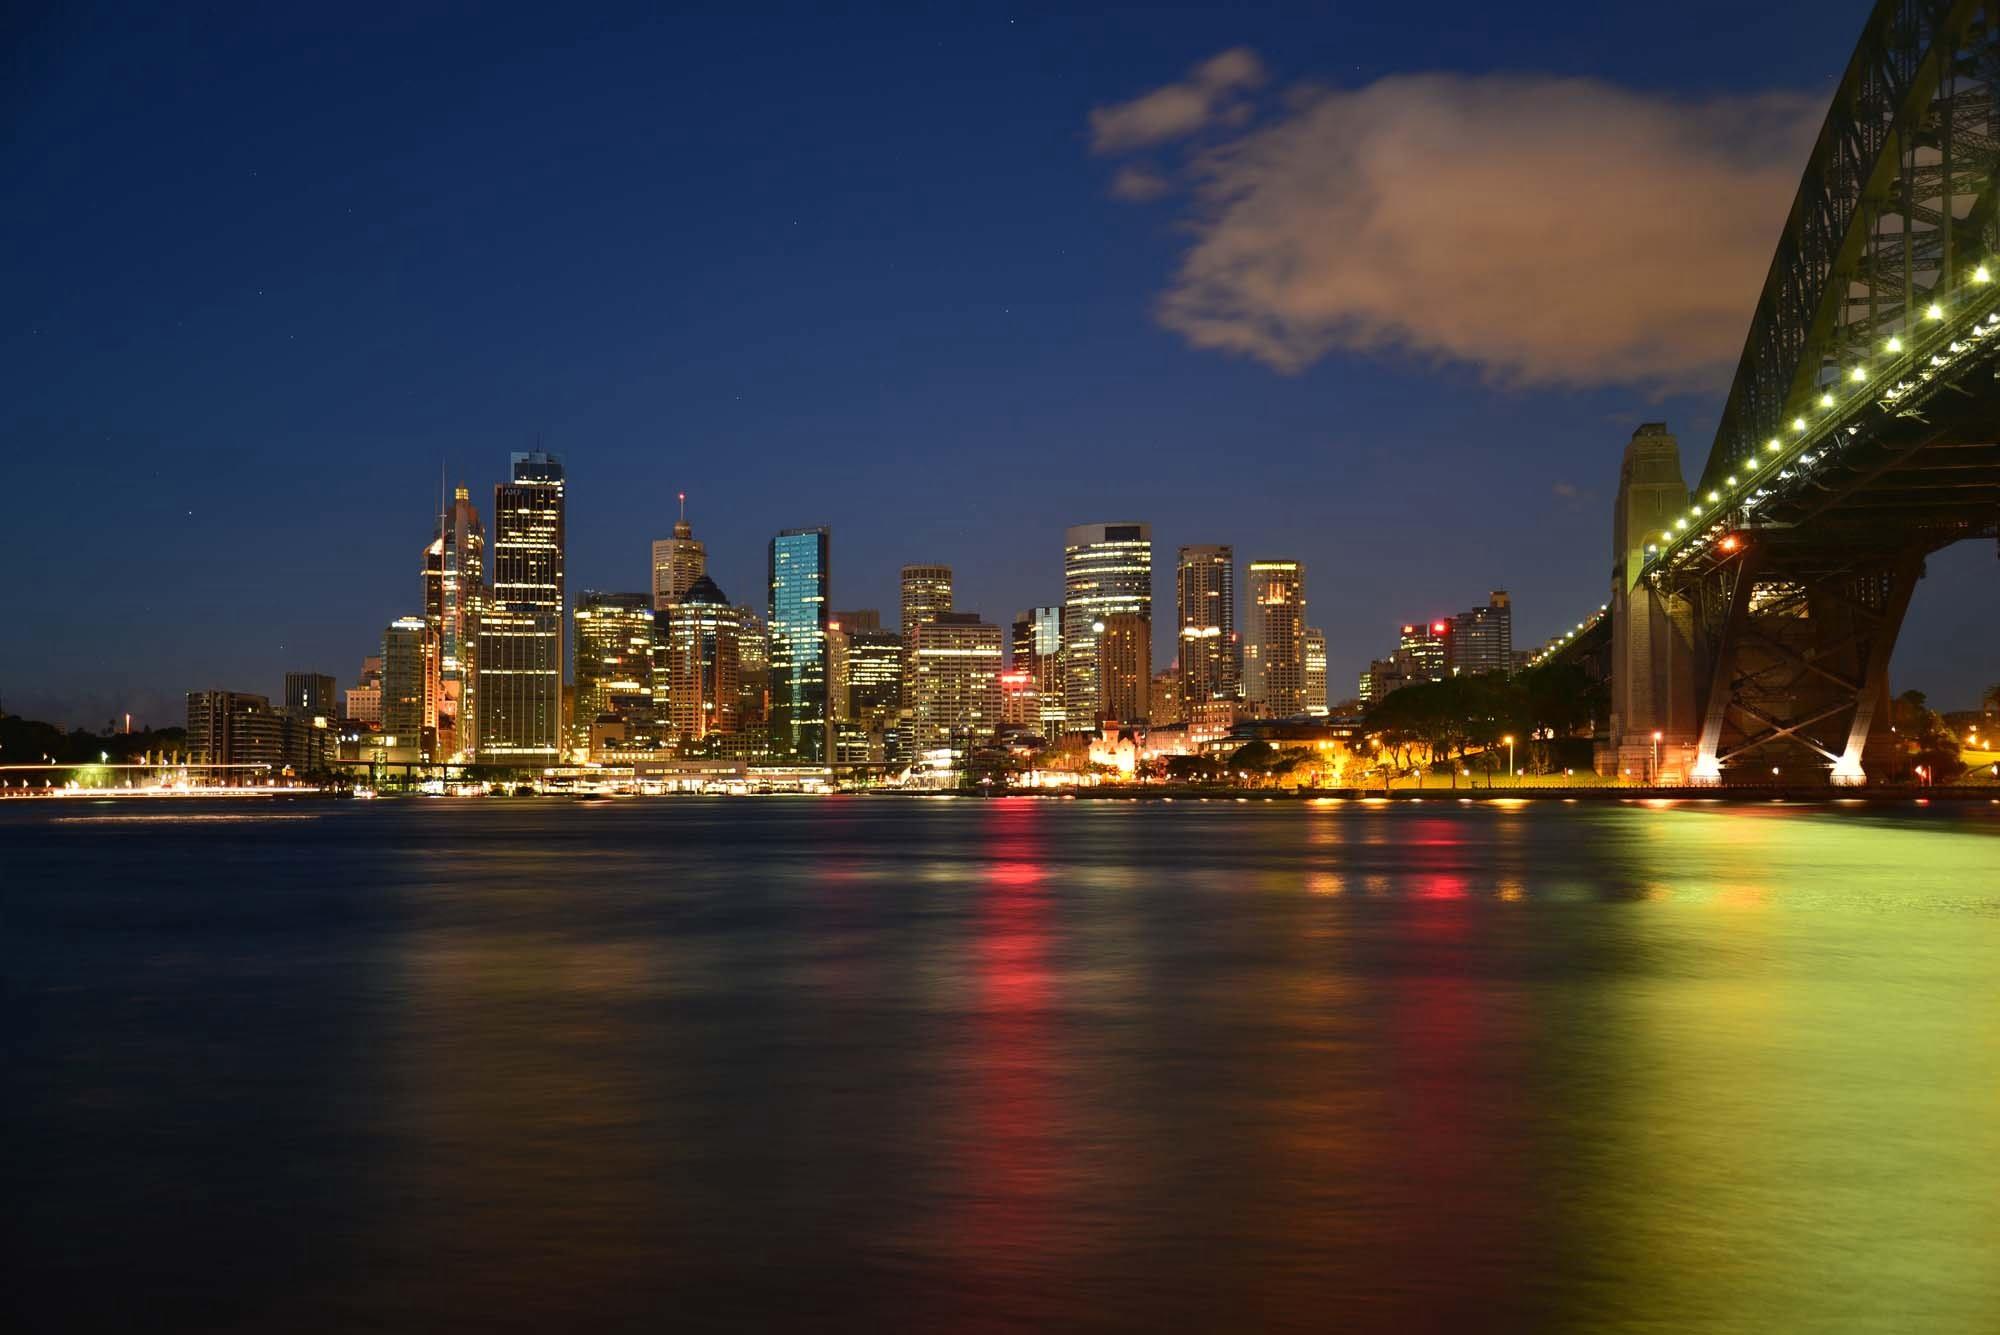 Milsons point em Sydney, Australia -Fonte Pexels